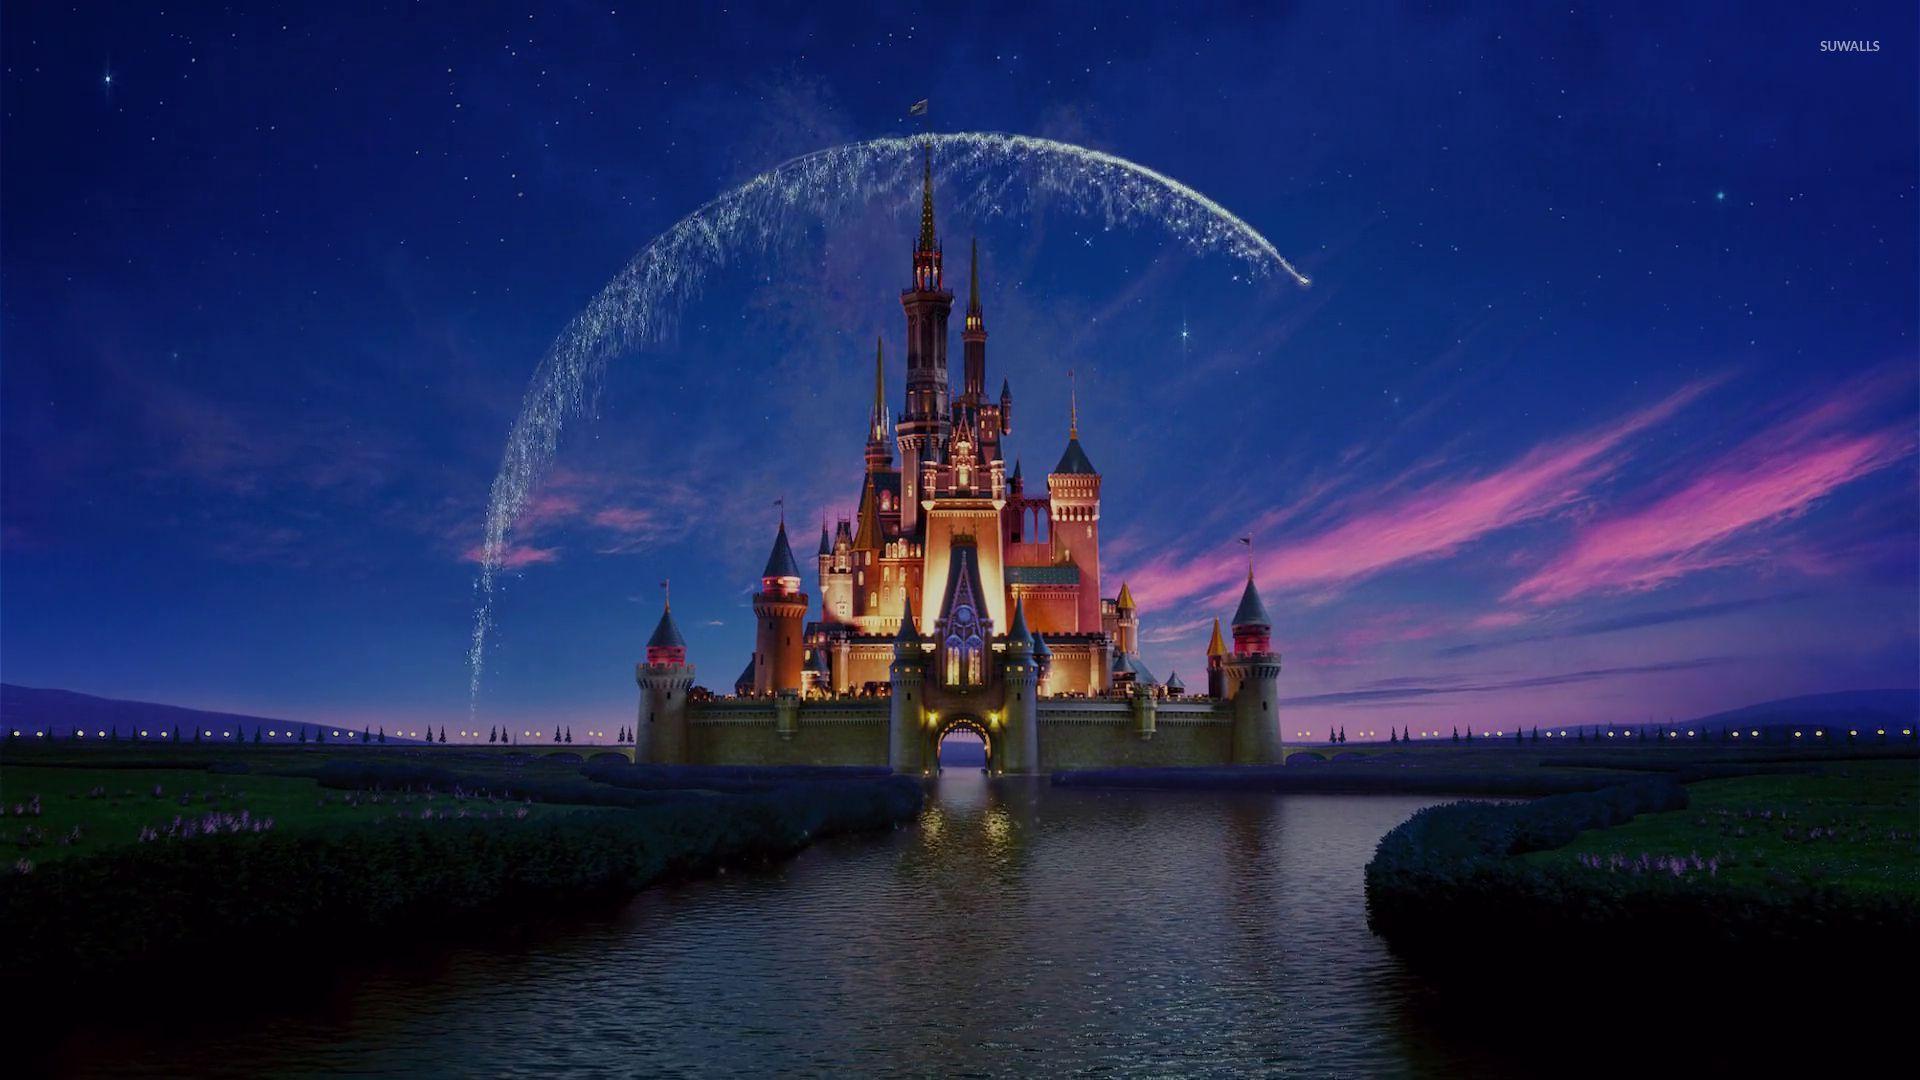 Disney castle wallpaper   Cartoon wallpapers   31399 1920x1080